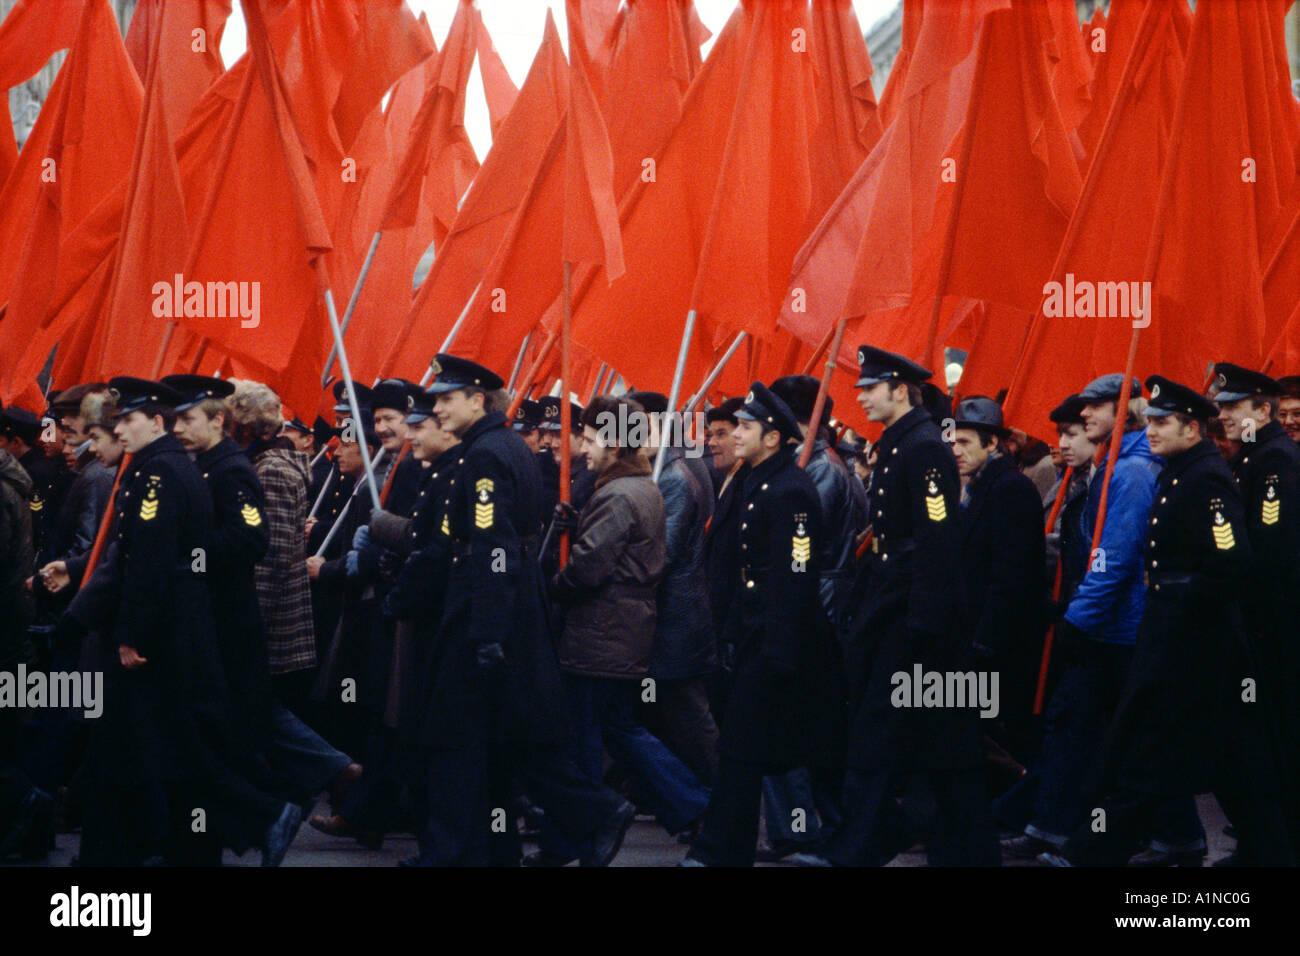 Parade feiert der Oktoberrevolution, St Petersburg, Russland Stockbild